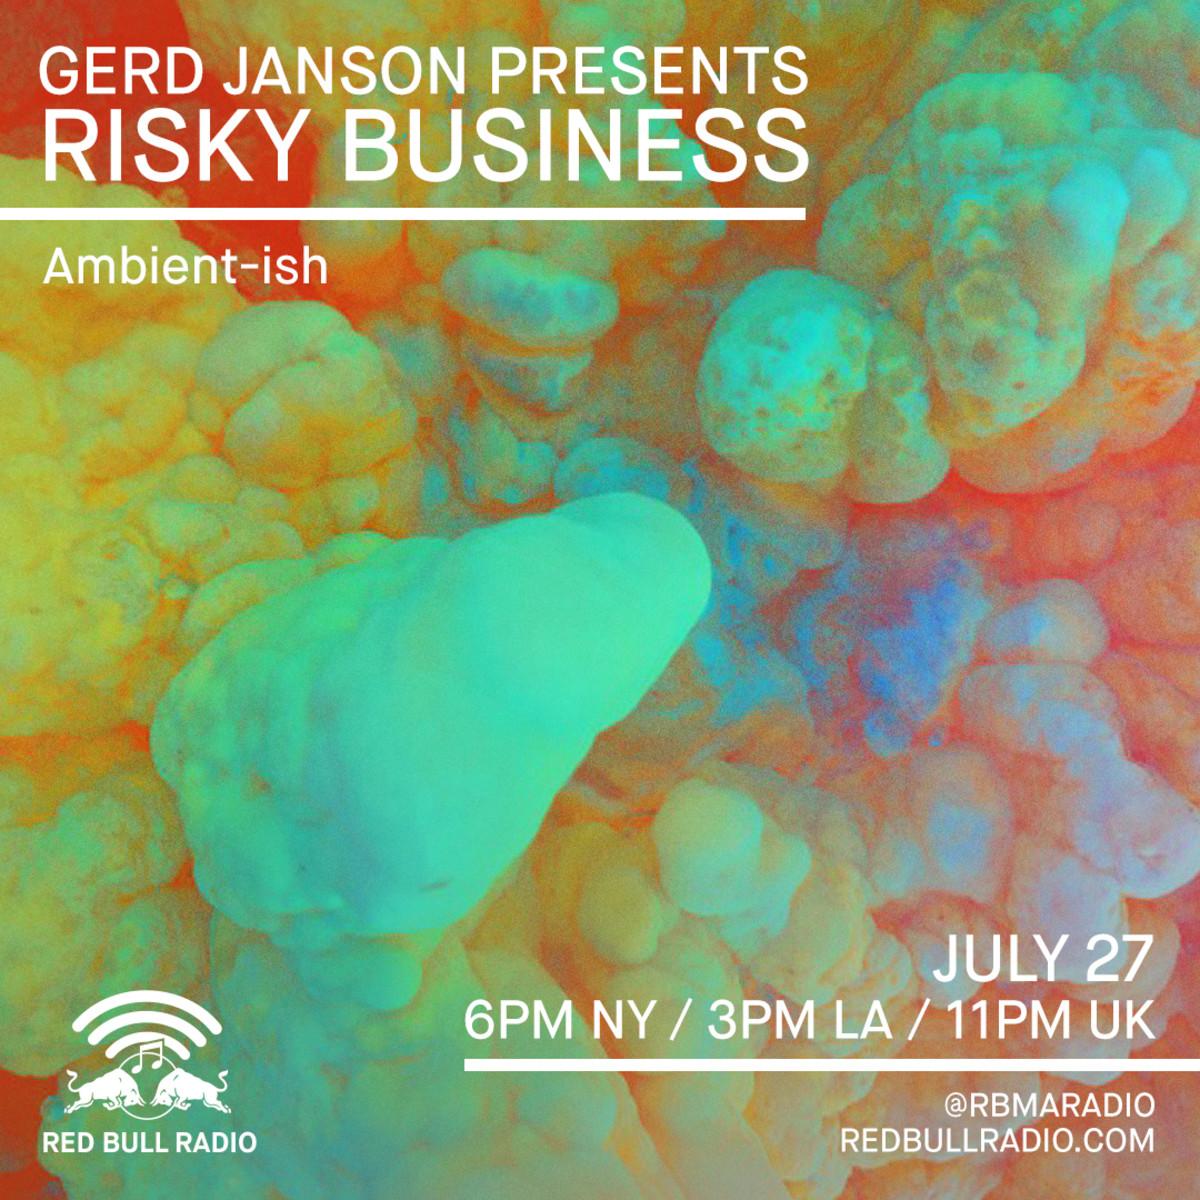 Jul_27_Gerd-Janson_Risky-Biz_Ambient-ish